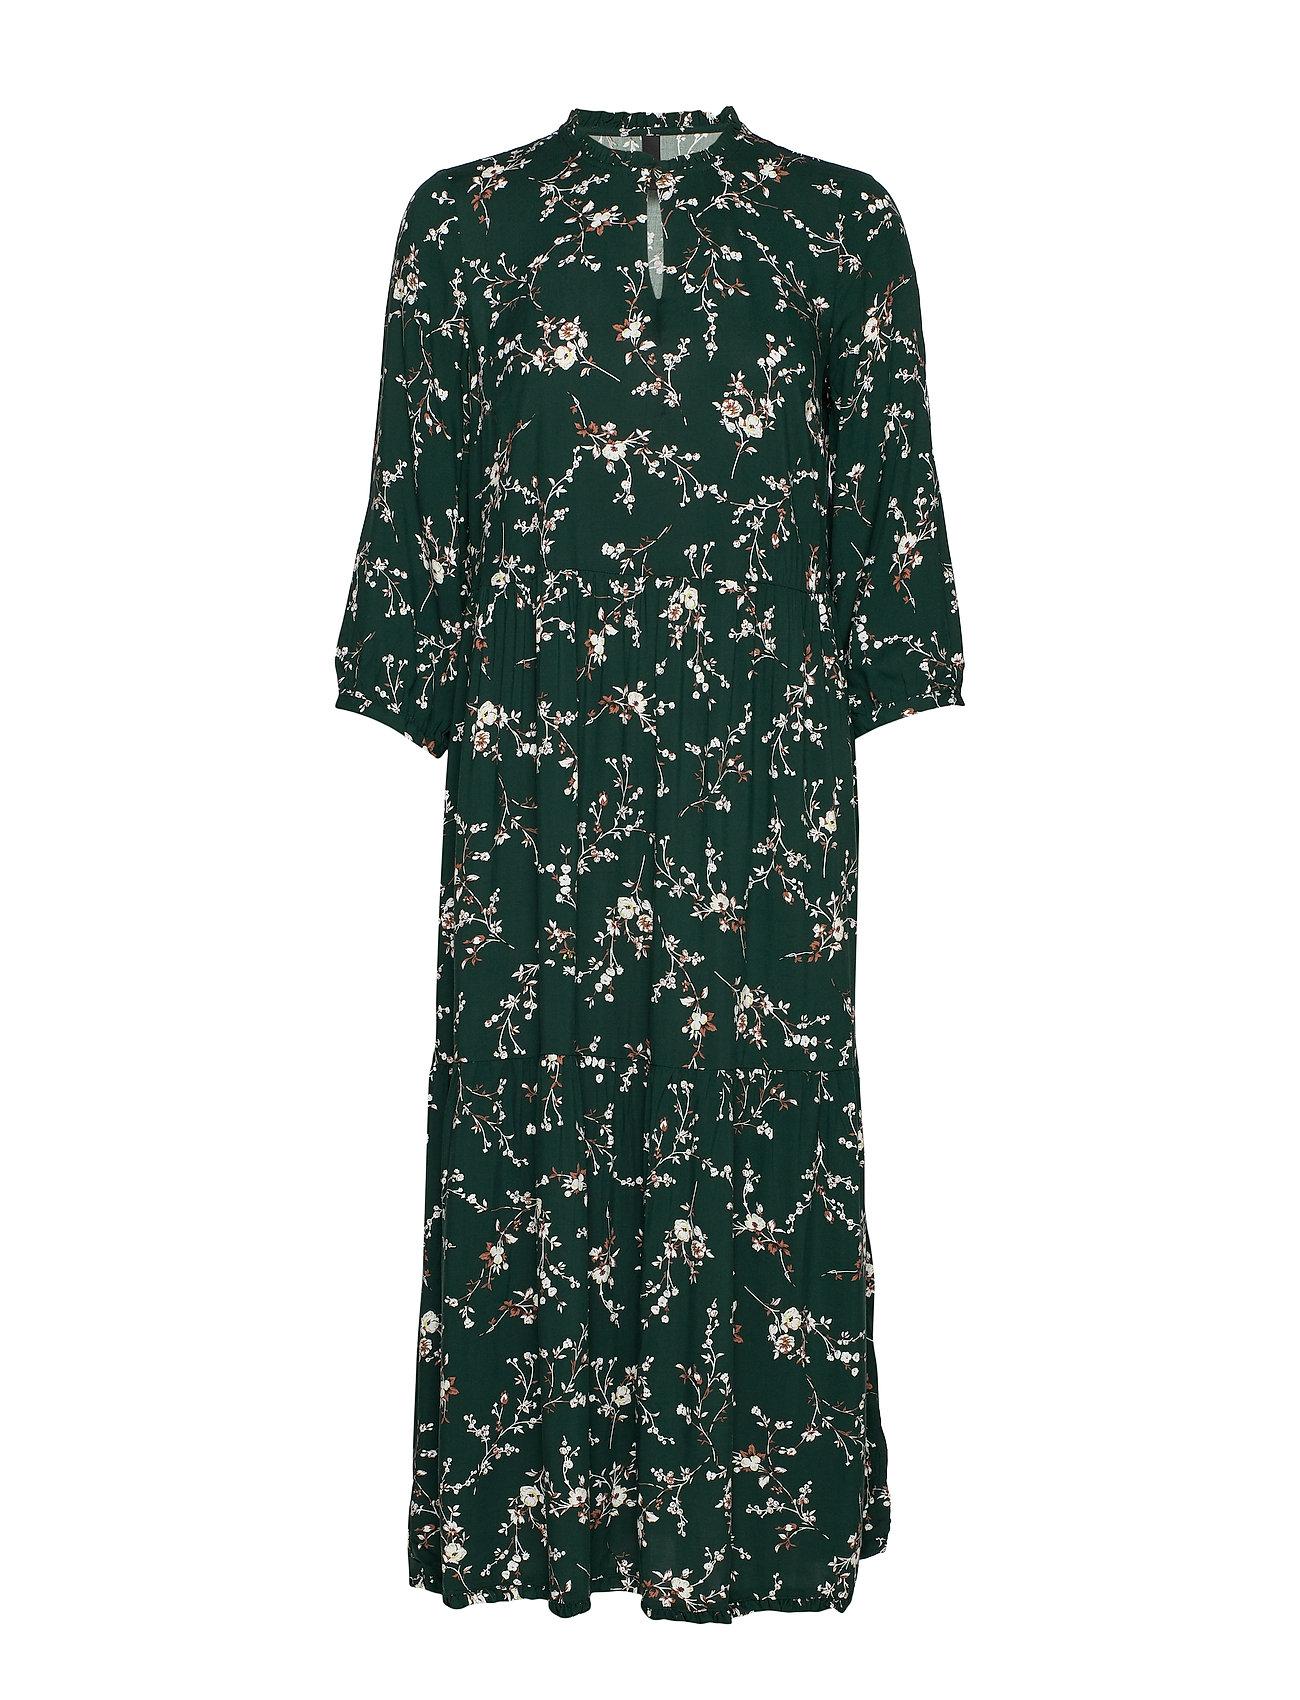 Aw D2dbotanical Dress Yaspleana Long GardenYas ZPXOkiu